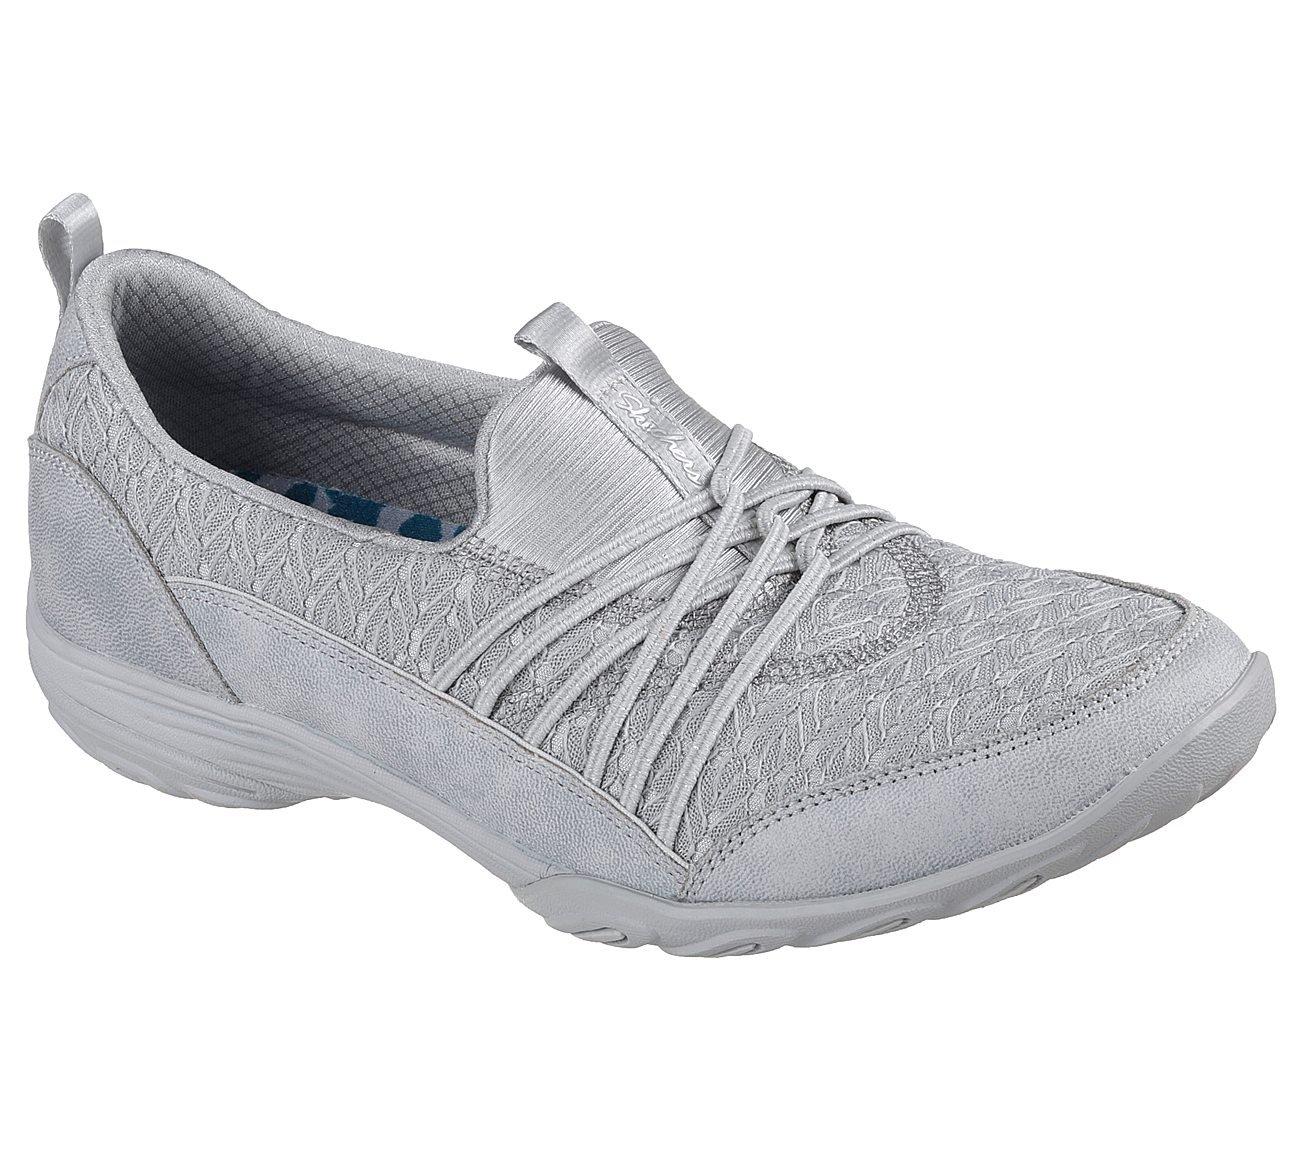 Skechers Women's Empress-Wide-Awake Sneaker B07B2XXG36 11 C/D US Light Gray